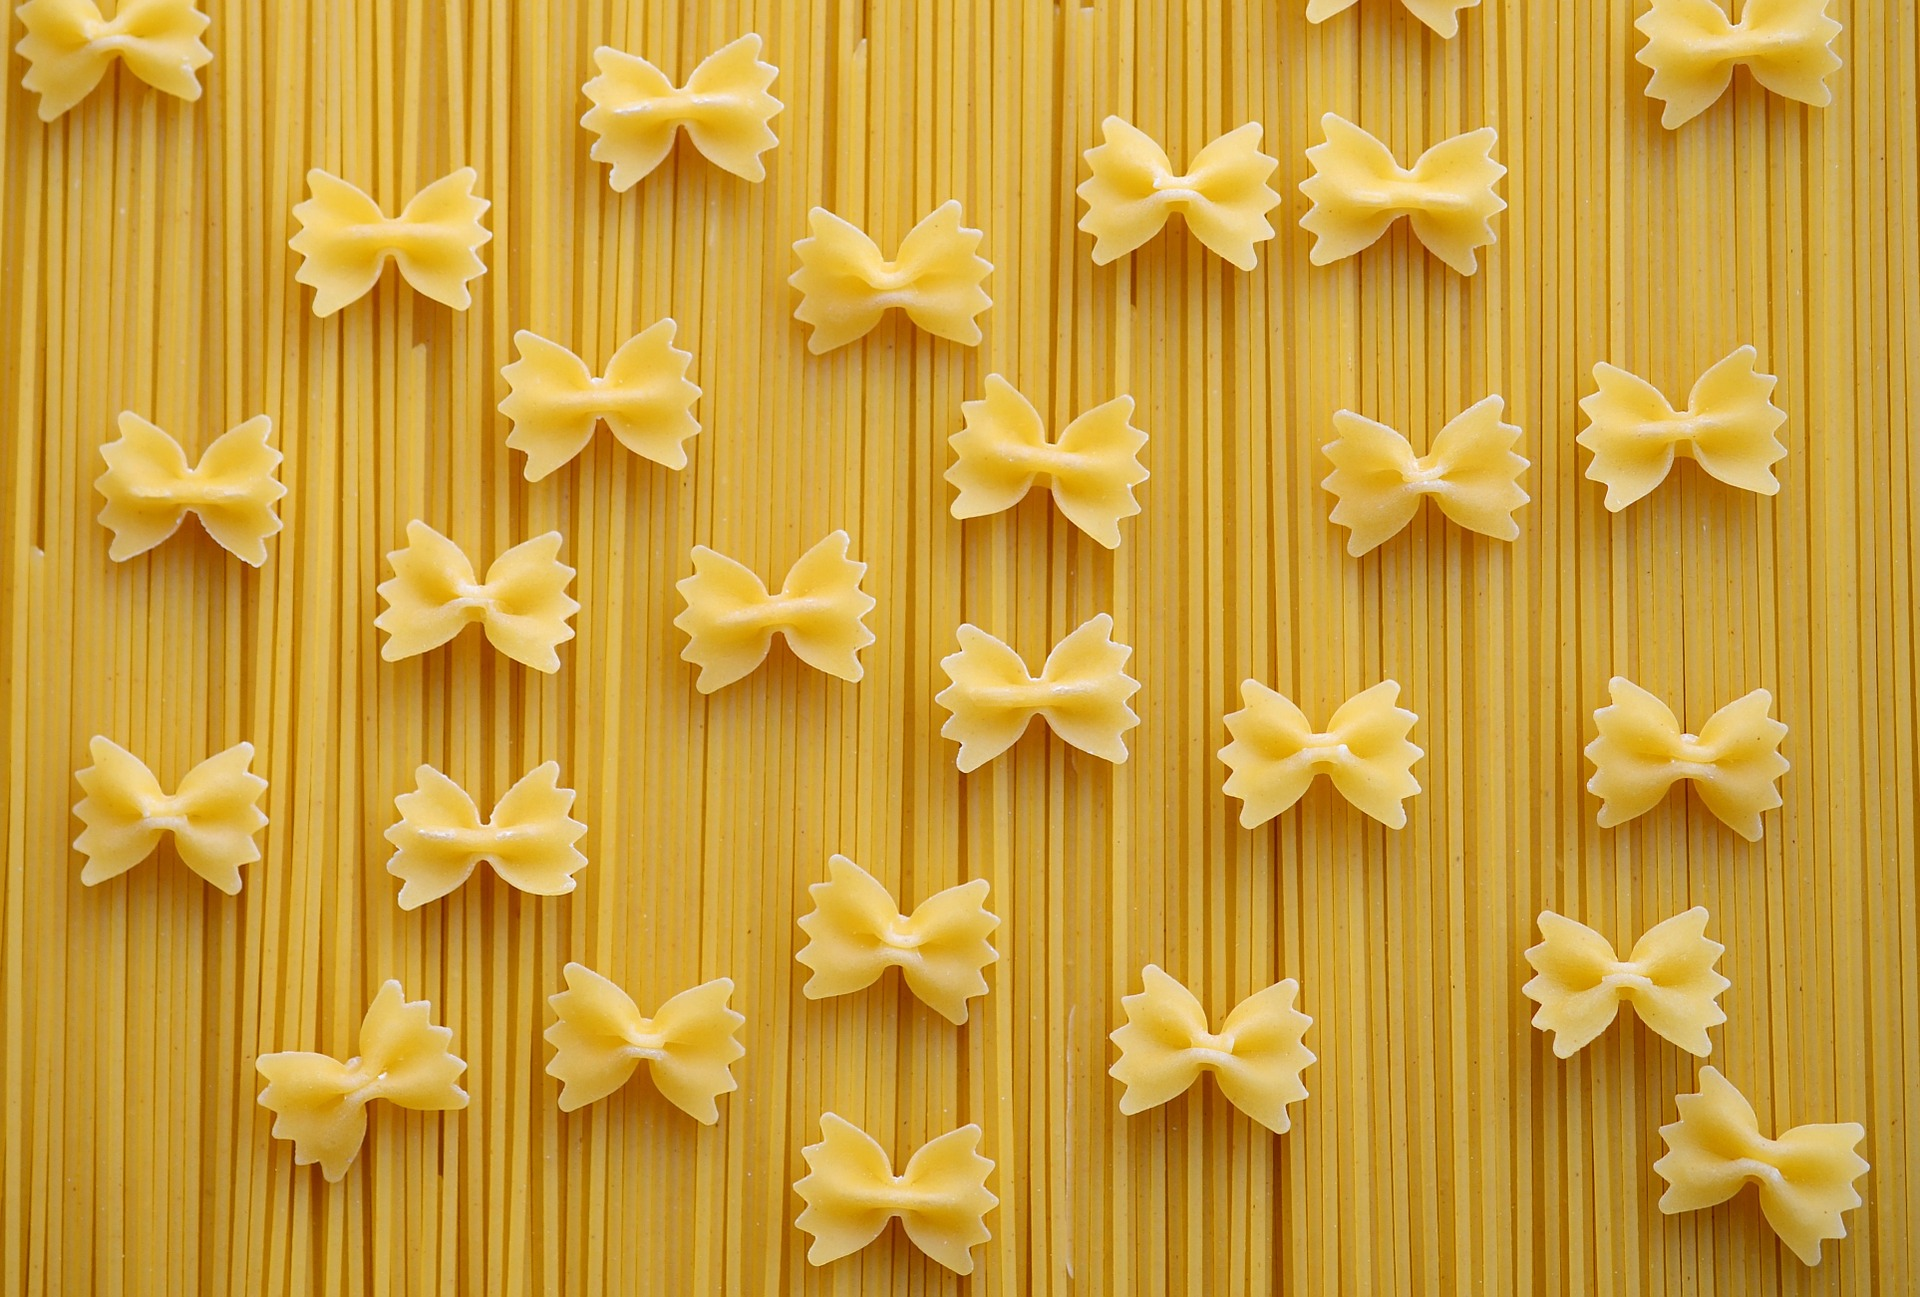 fideos, pasta, espaguetis, lazos, comida italiana - Fondos de Pantalla HD - professor-falken.comjpg